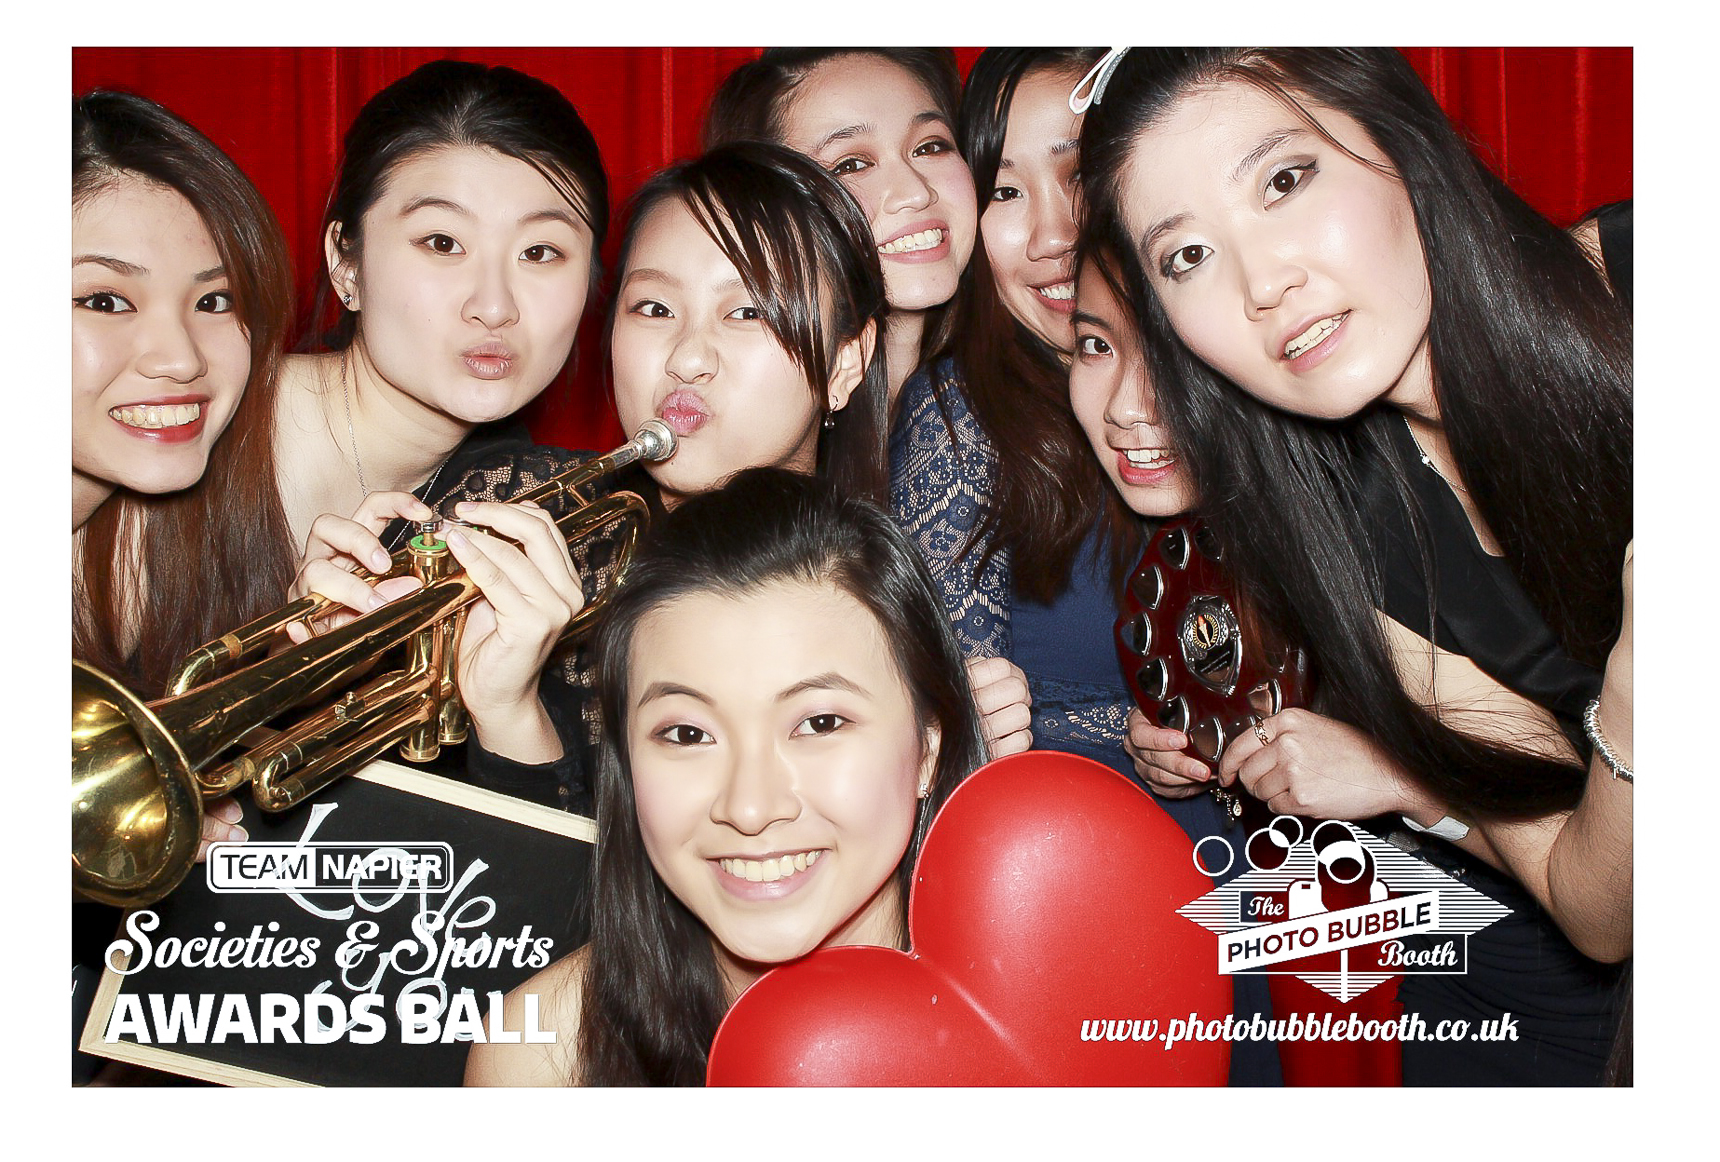 Napier Societies & Sports Awards_34.JPG